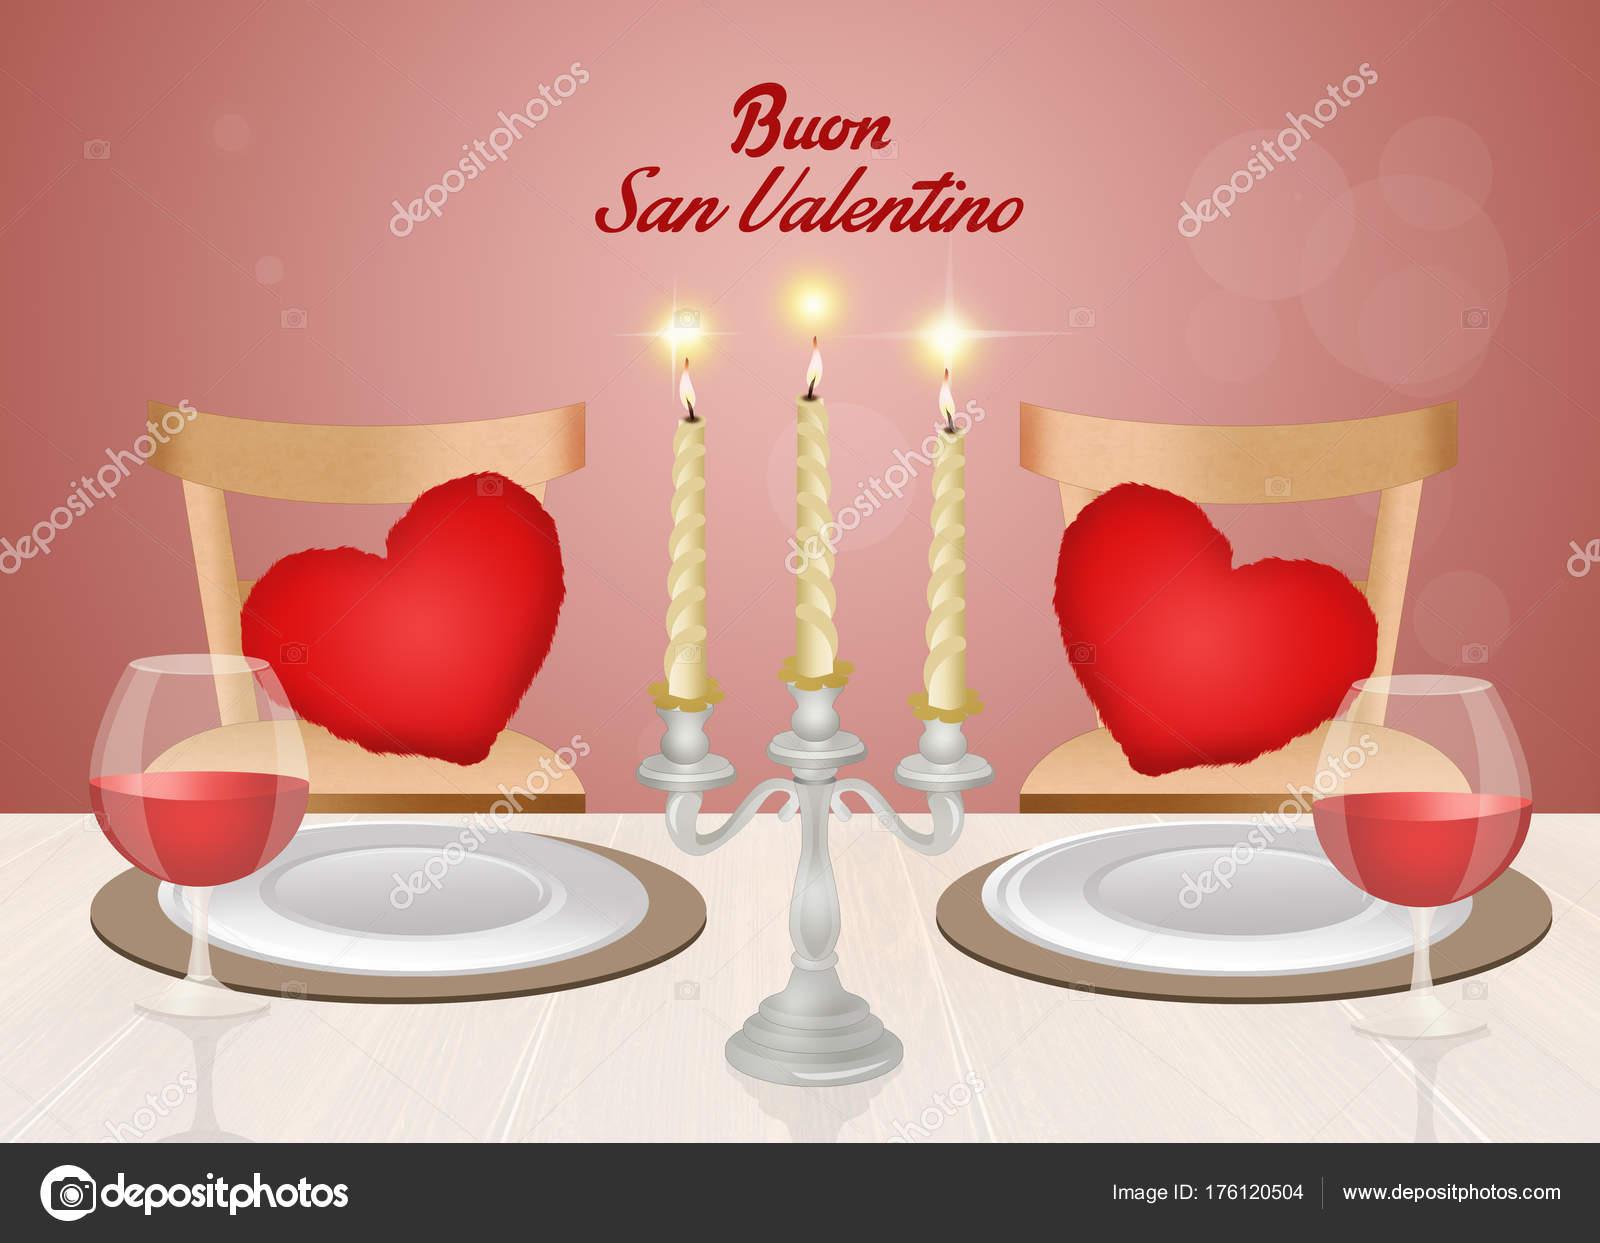 Illustration Romantic Dinner Valentines Day Stock Photo